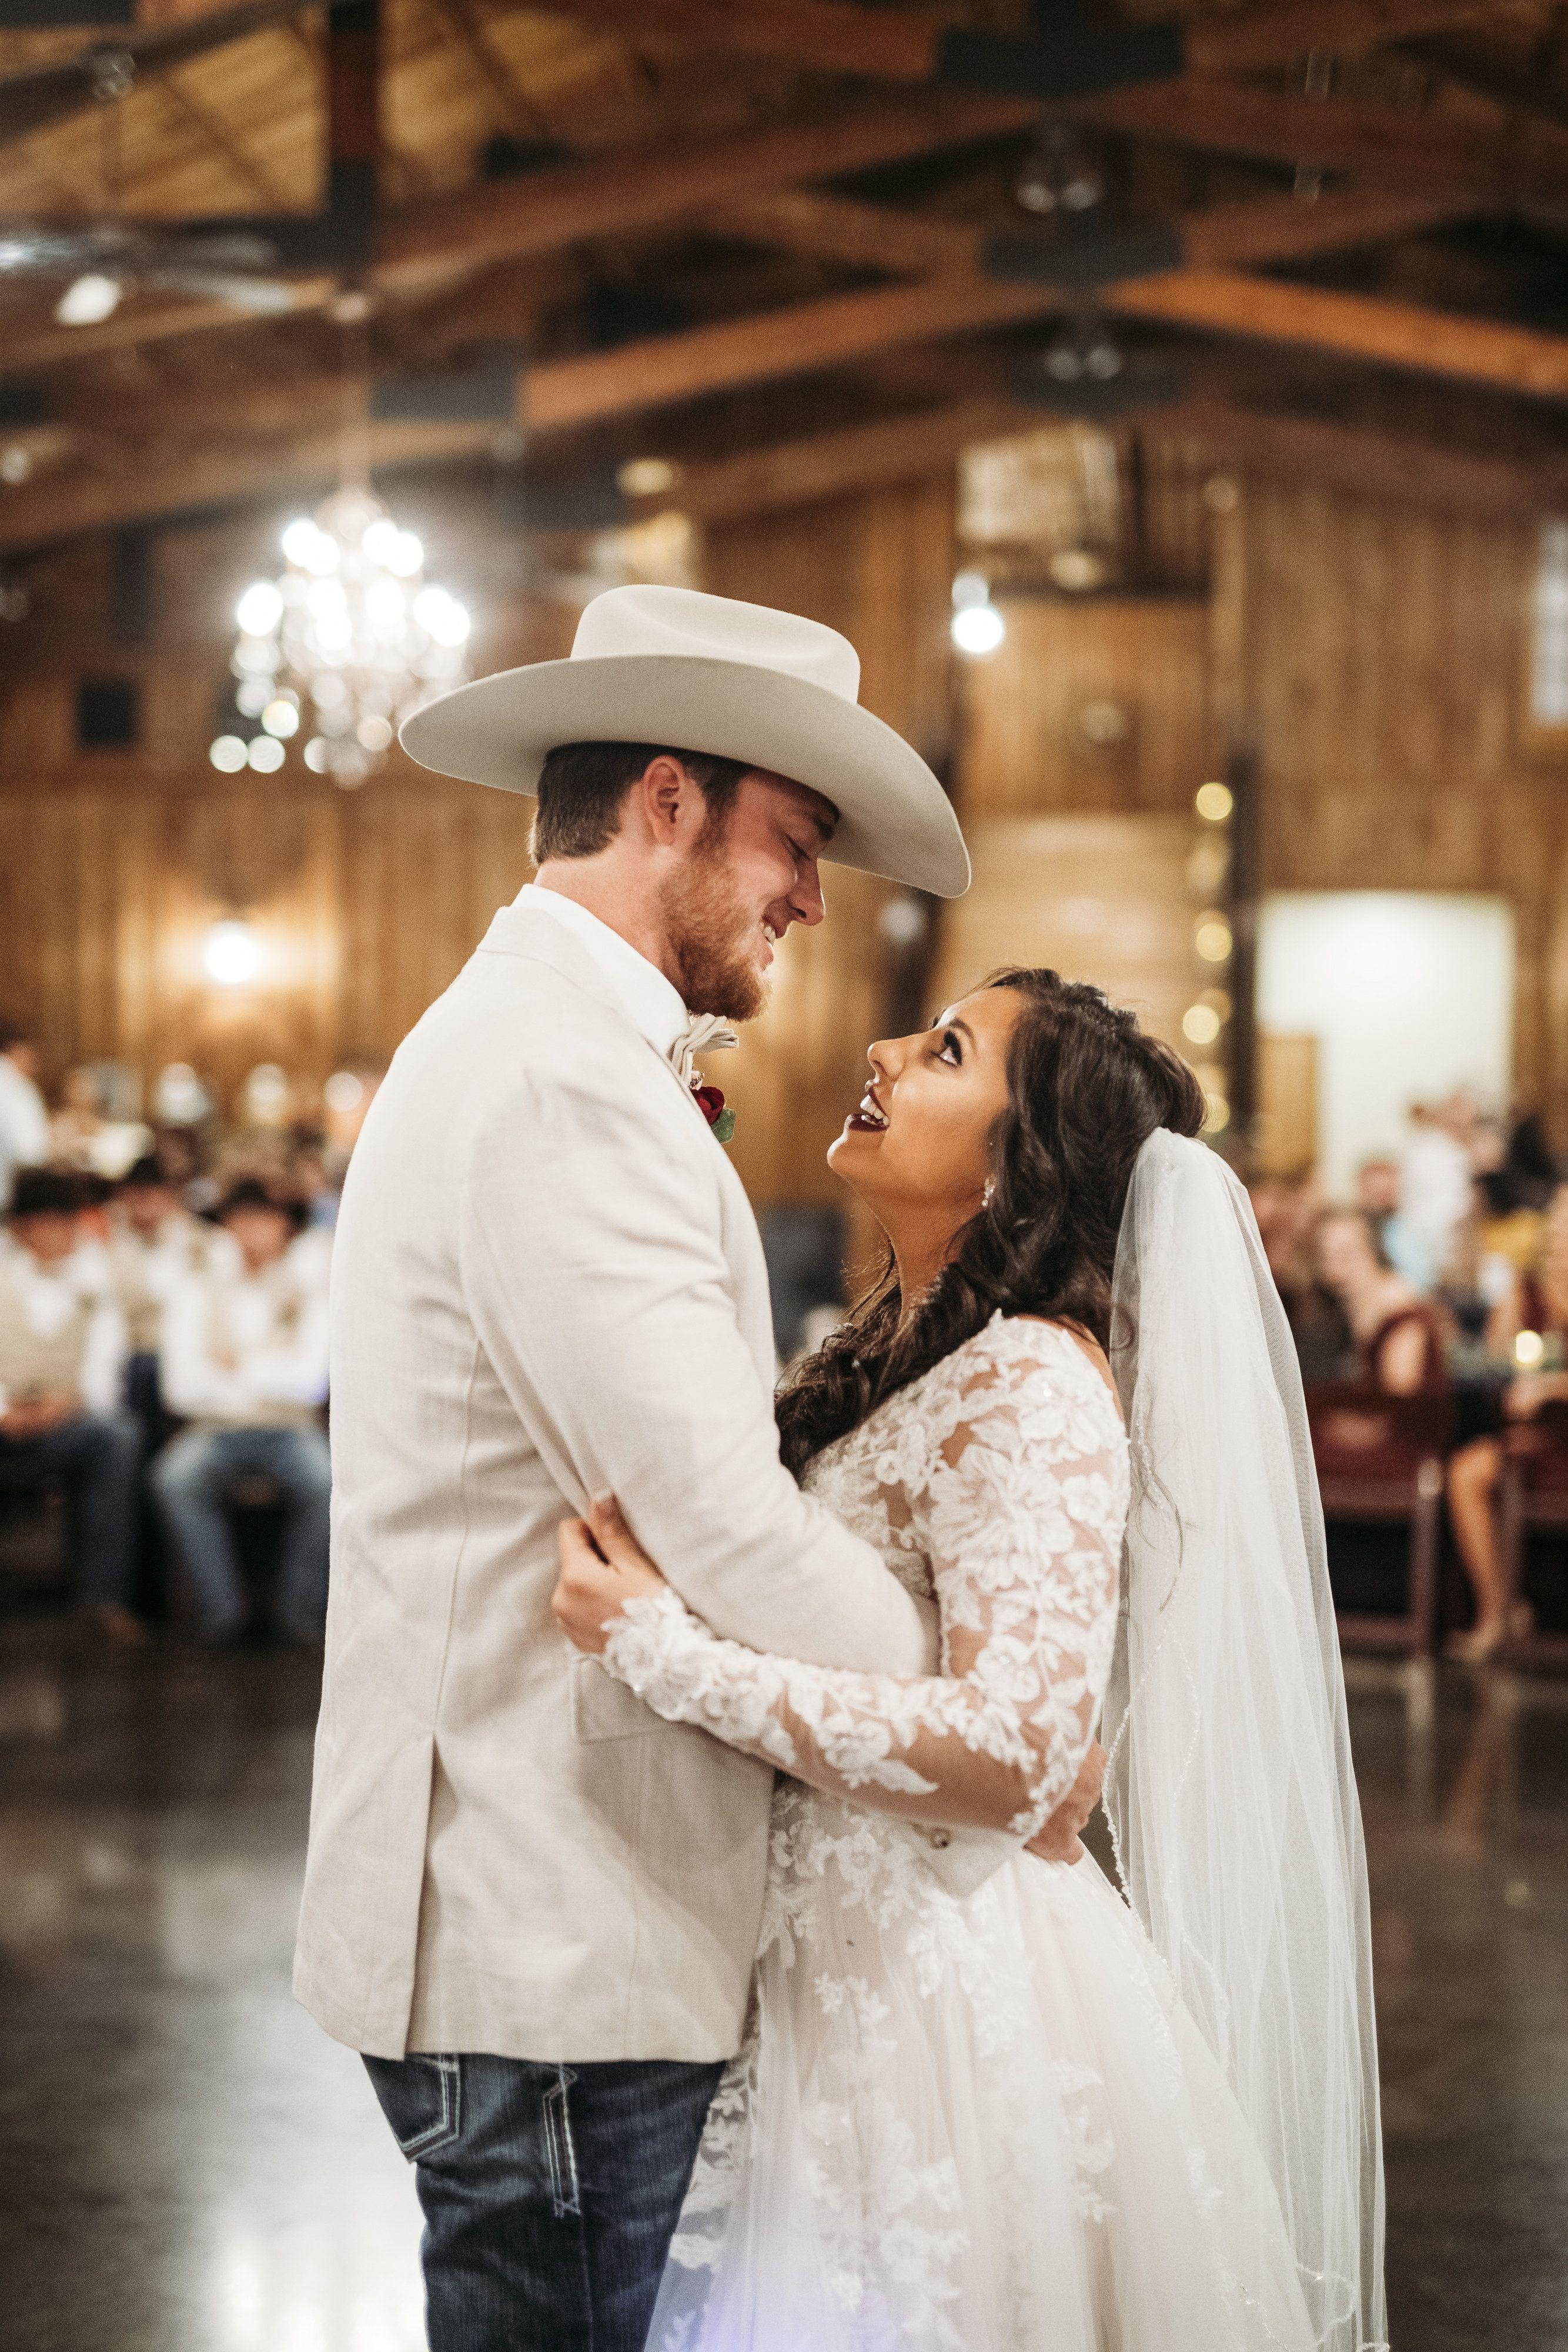 Wedding Venue Norman Oklahoma Oklahoma Wedding Venues Oklahoma Wedding Wedding Venues